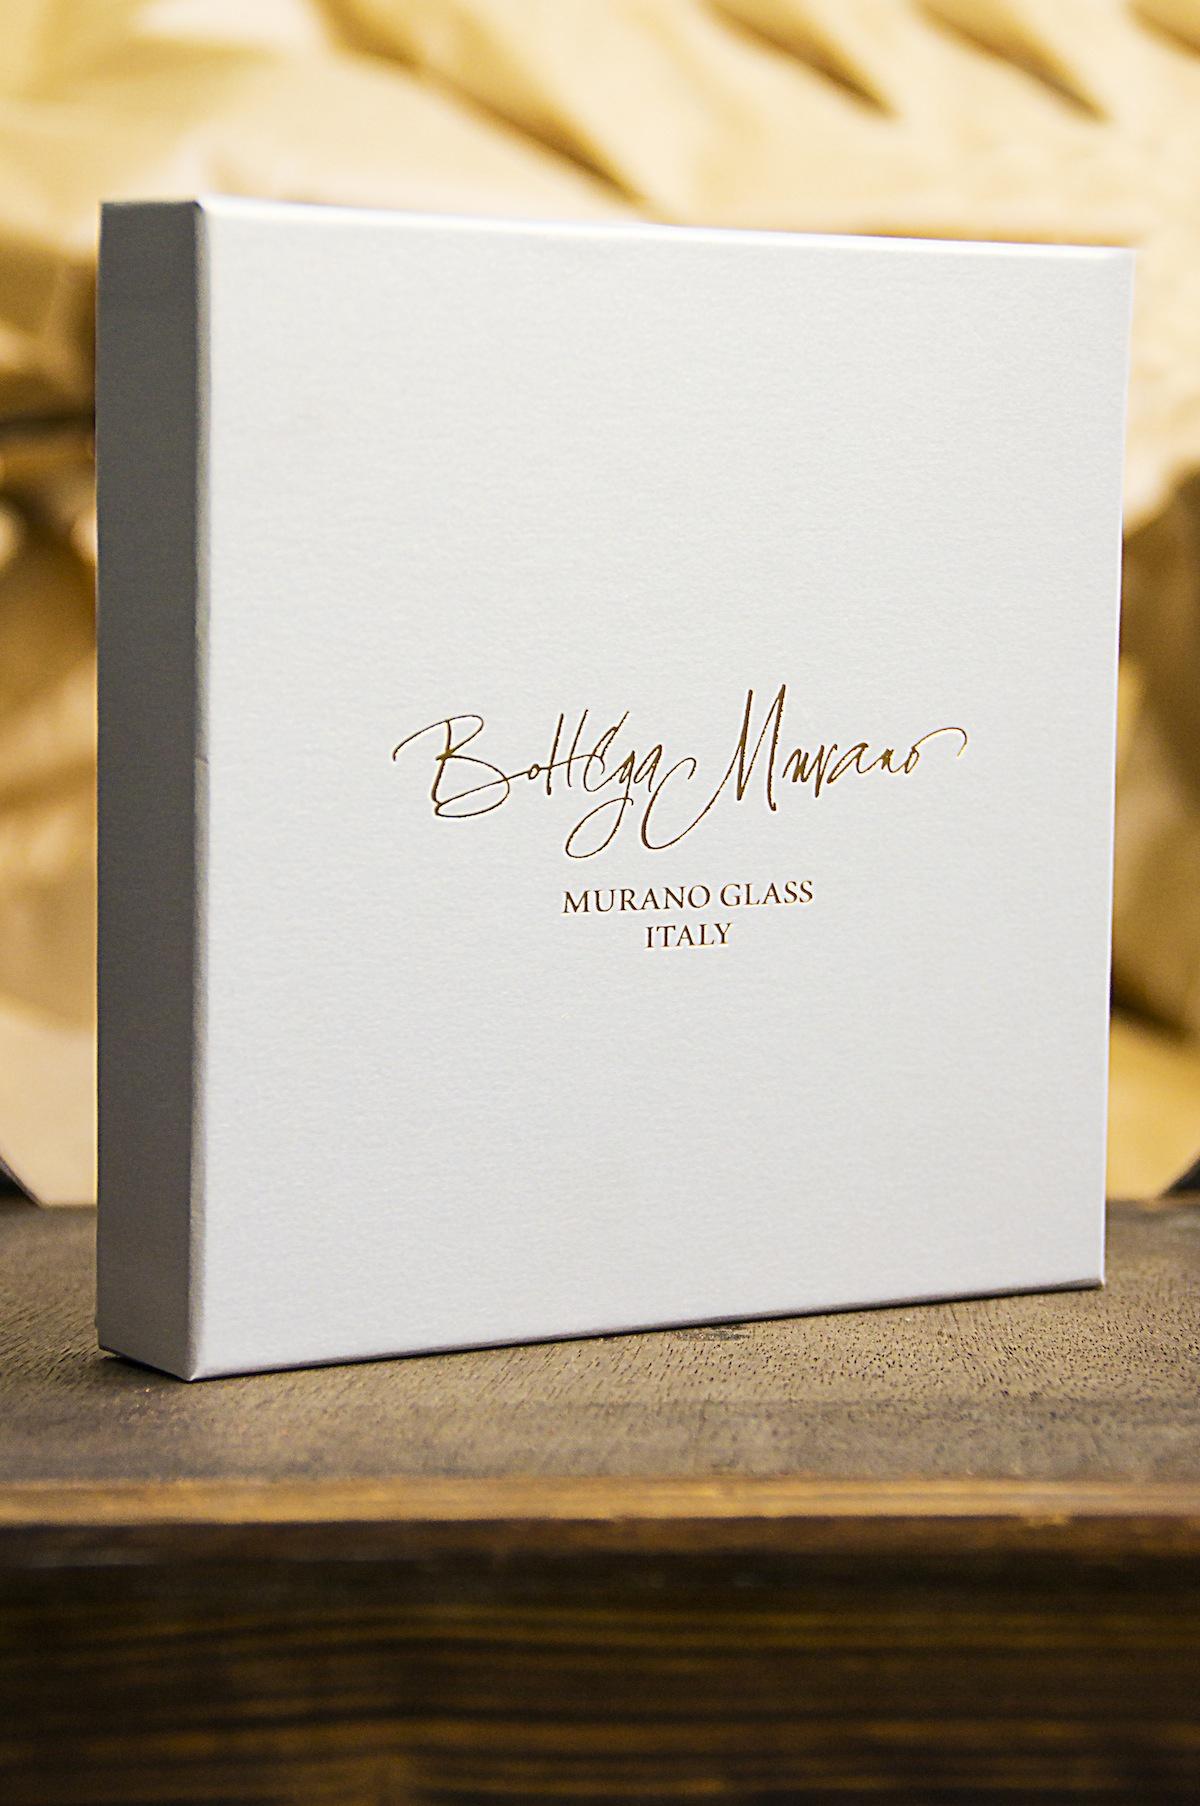 Комплект бижутерии Bottega Murano (7096)